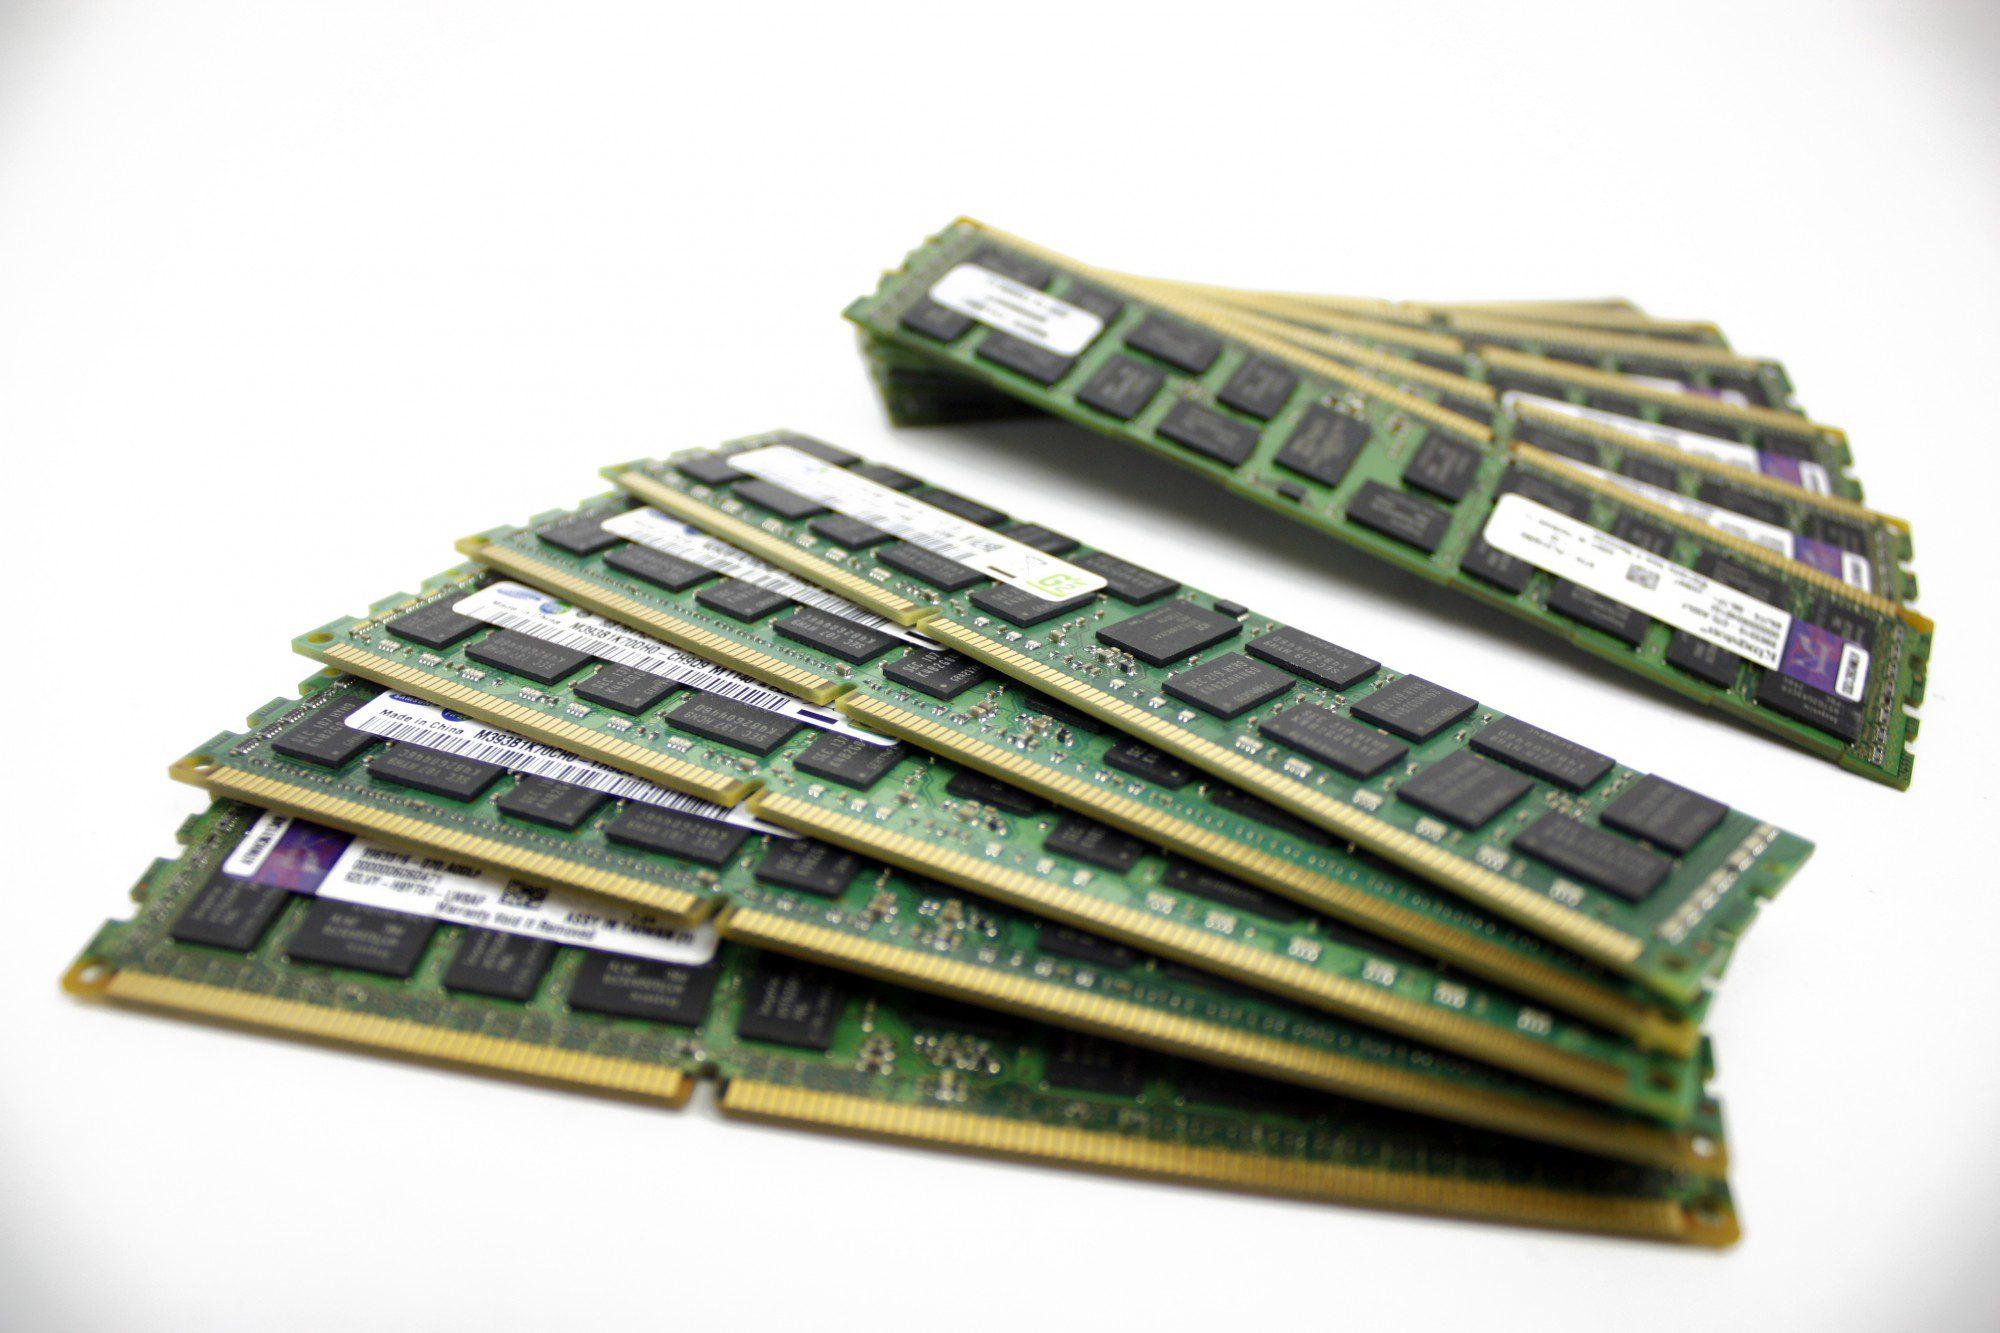 DDR3 RAM sticks picture 2